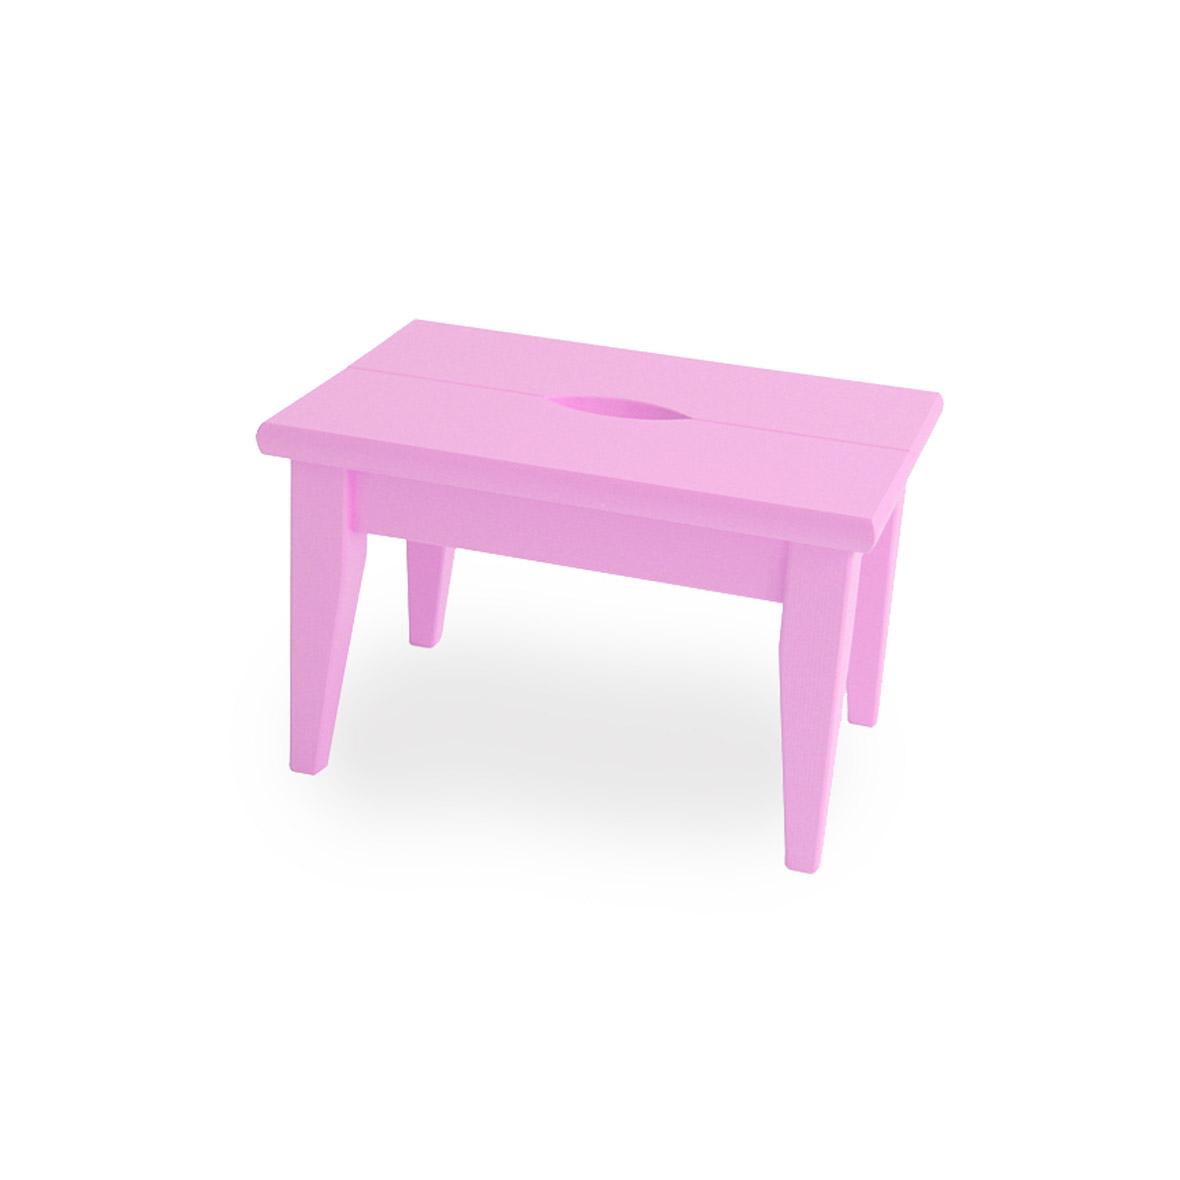 tritthocker fichtenholz fsc 100% pink lackiert